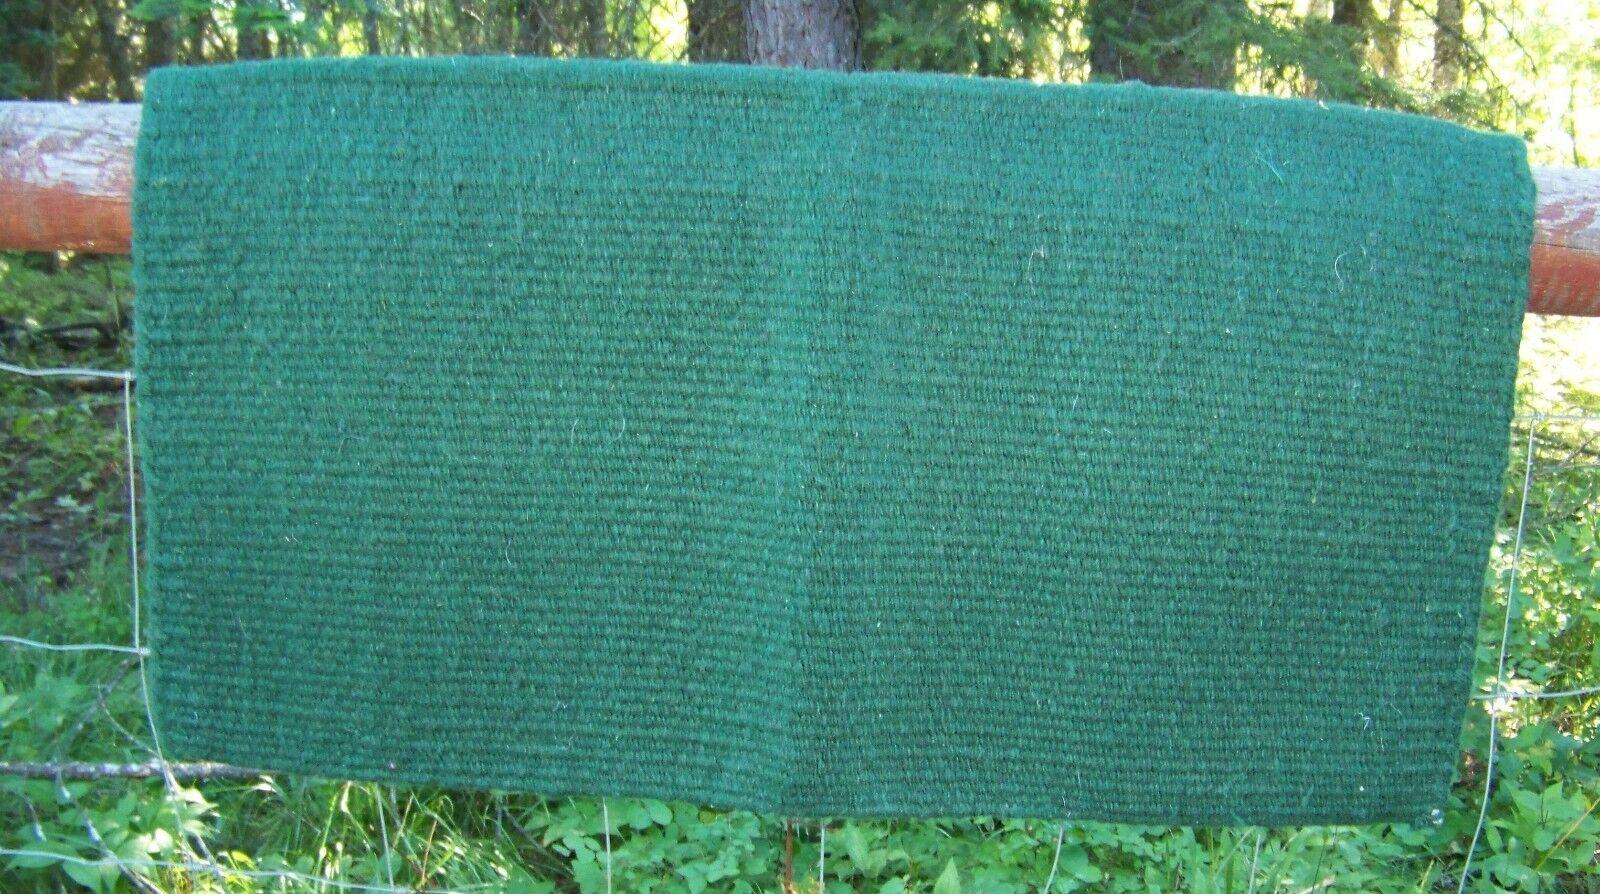 San Juan Solid Wool Show Blanket - 34 x 36 (Hunter Green) by Mayatex